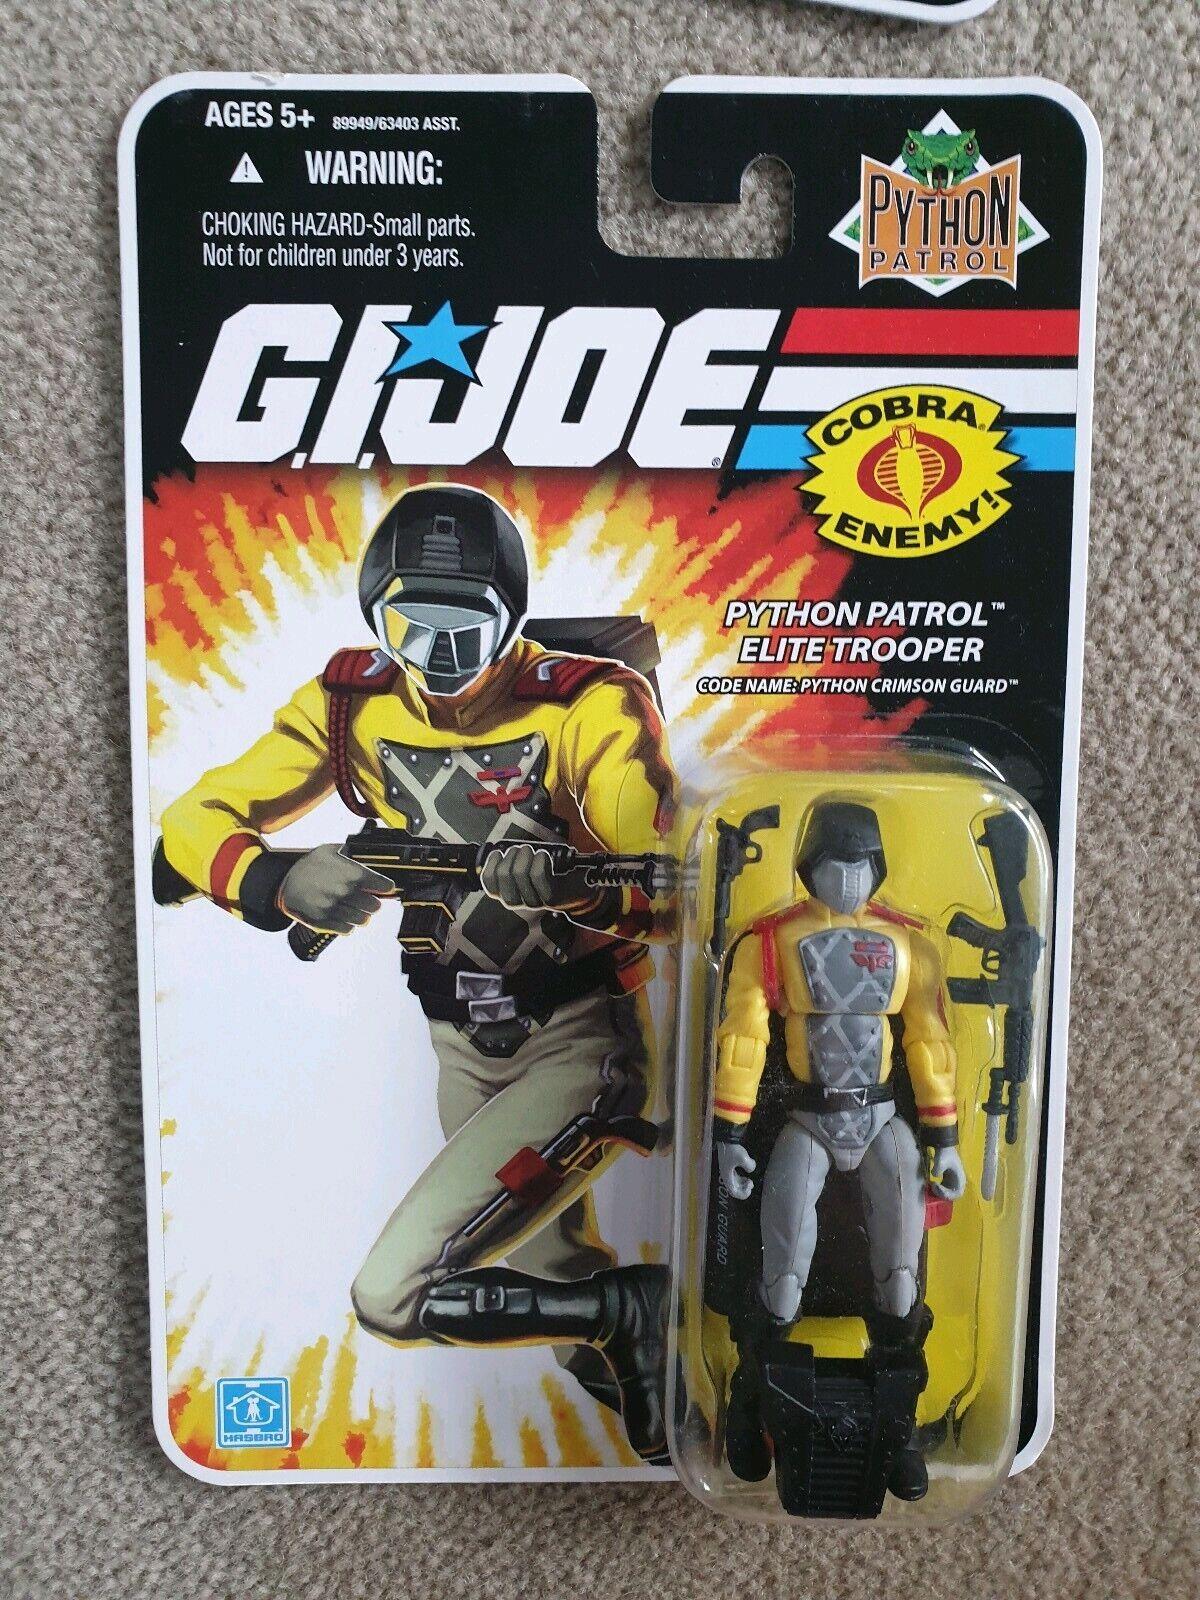 GI Joe 25th python patrol elite trooper crimson guard